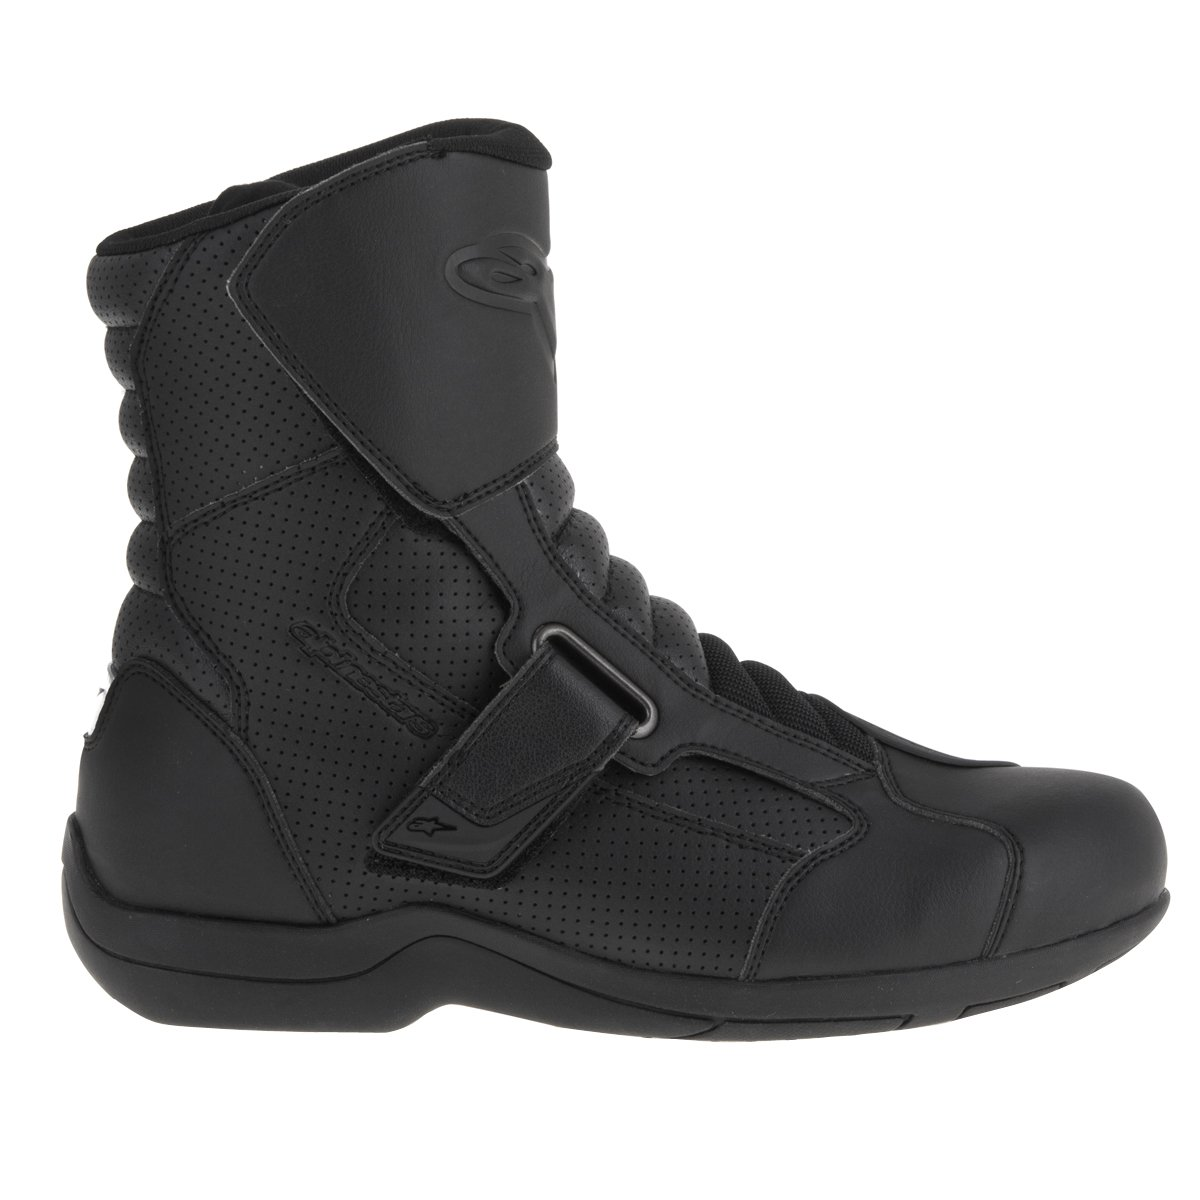 Alpinestars Ridge 2 Air Men's Street Motorcycle Boots - Black / 47